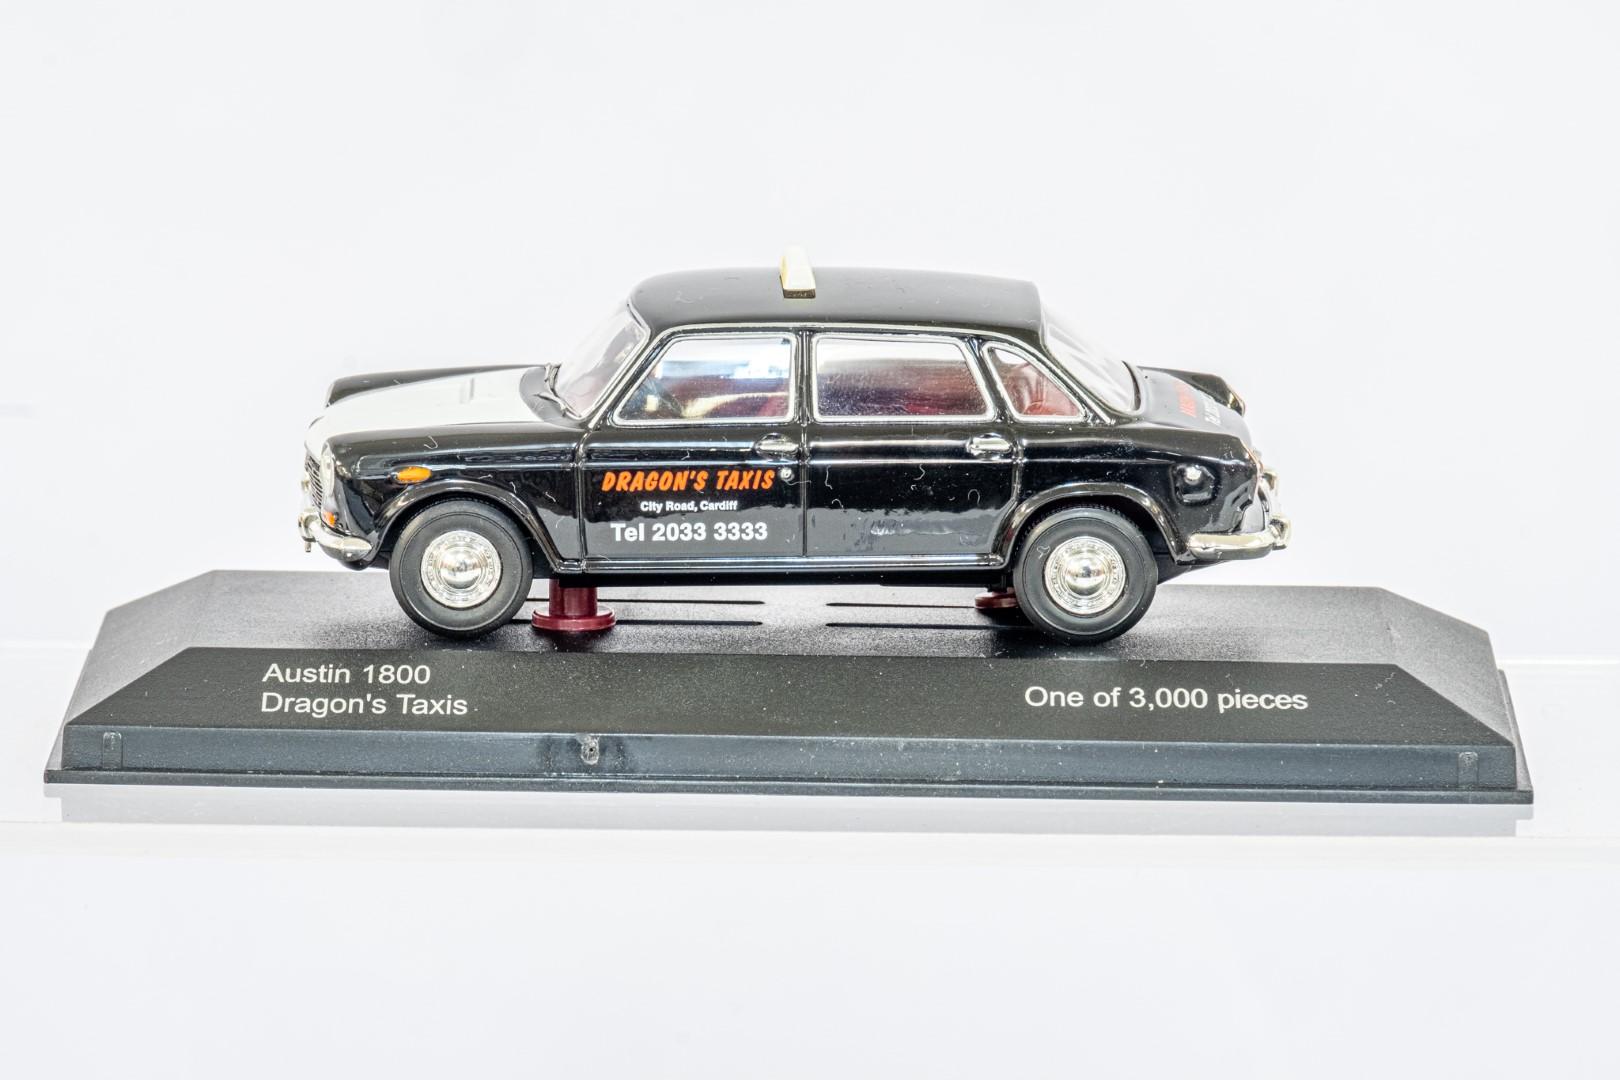 Vanguards Austin 1800 - Dragon's Taxis / Daimler Sovereign - Old English White - Image 3 of 3